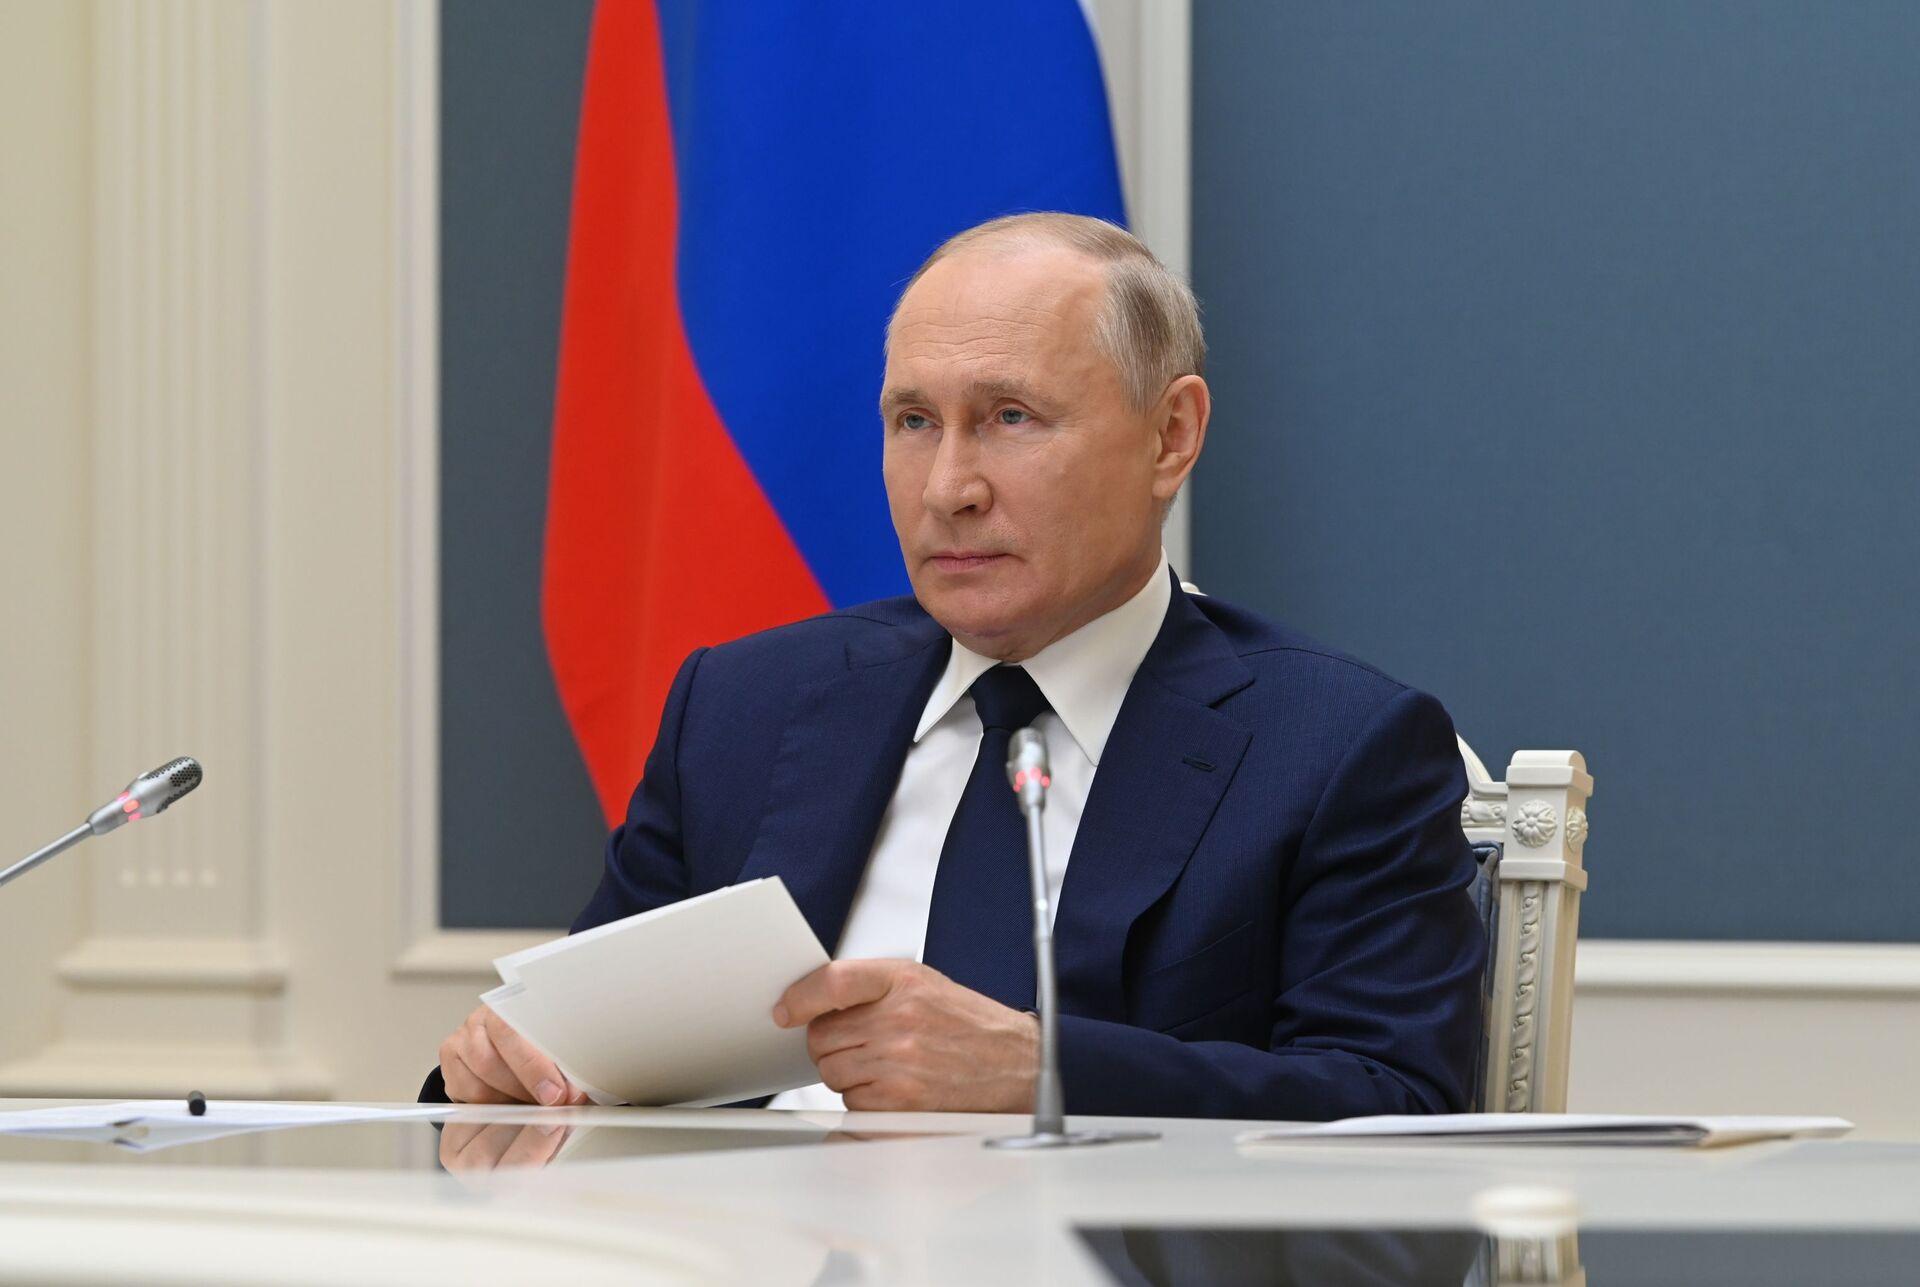 Tổng thống Nga Vladimir Putin - Sputnik Việt Nam, 1920, 05.10.2021